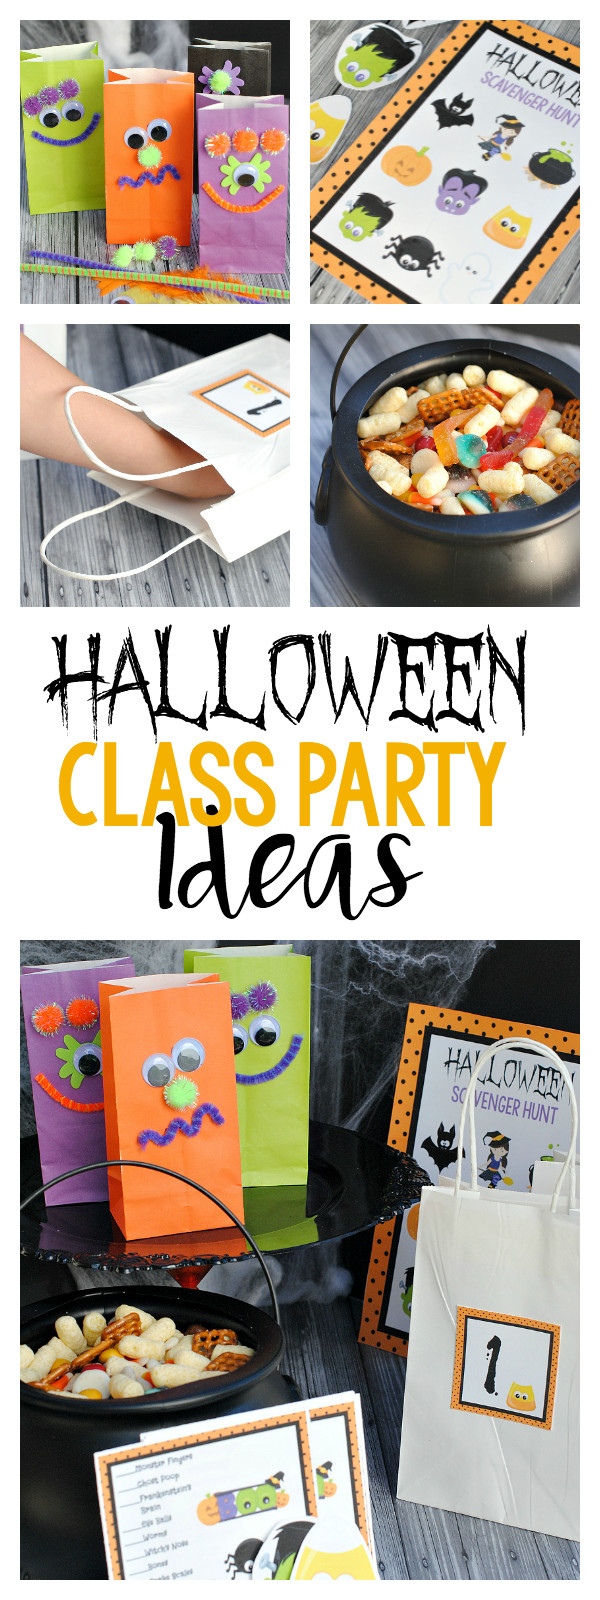 Funny Halloween Party Ideas  Easy & Fun Halloween School Party Ideas – Fun Squared